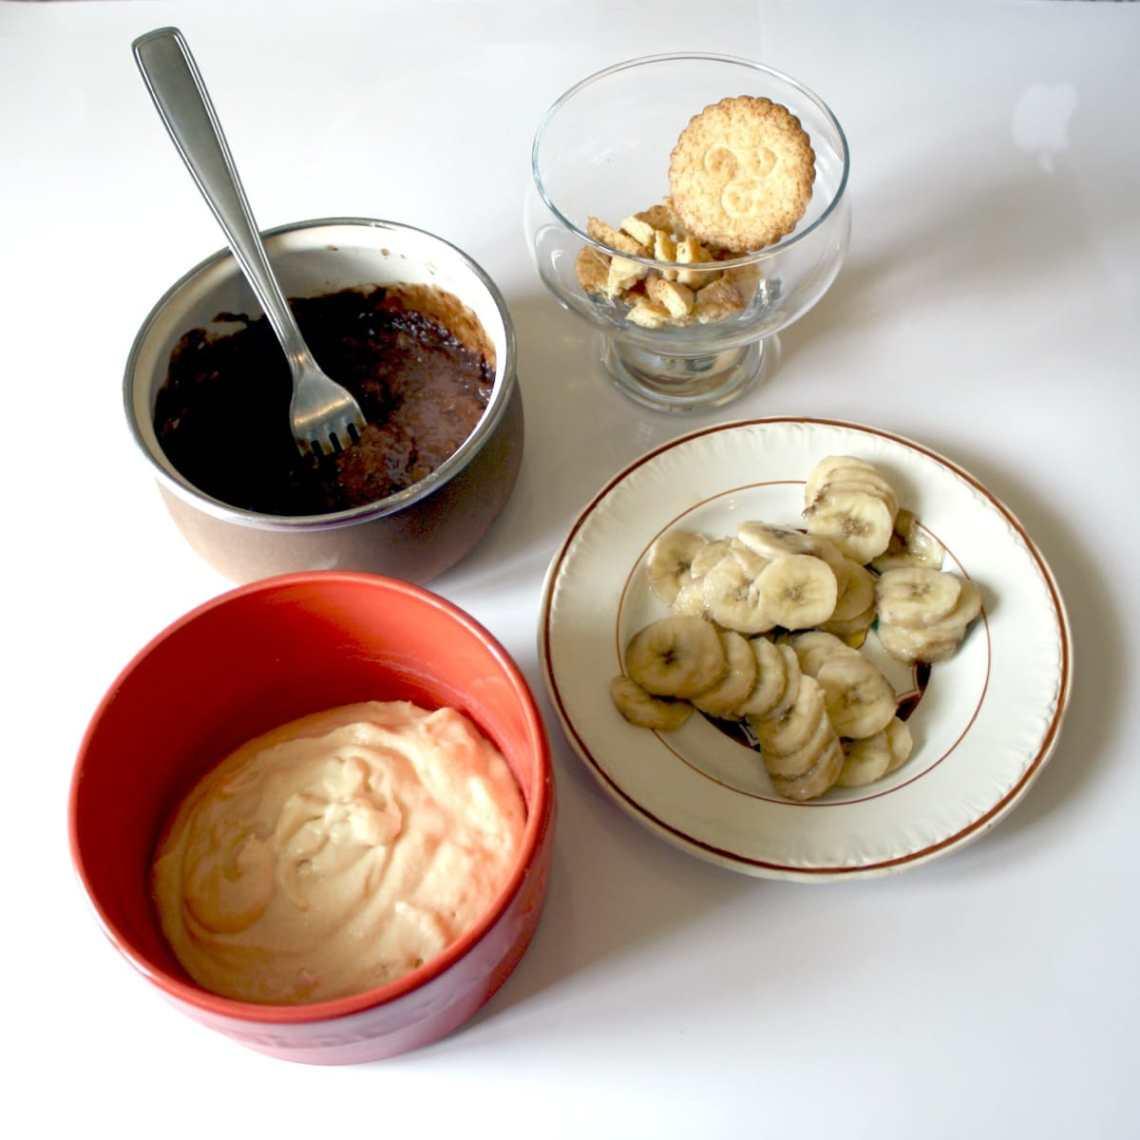 tiramisu banane nutella prepa - Tiramisu à la banane et au Nutella